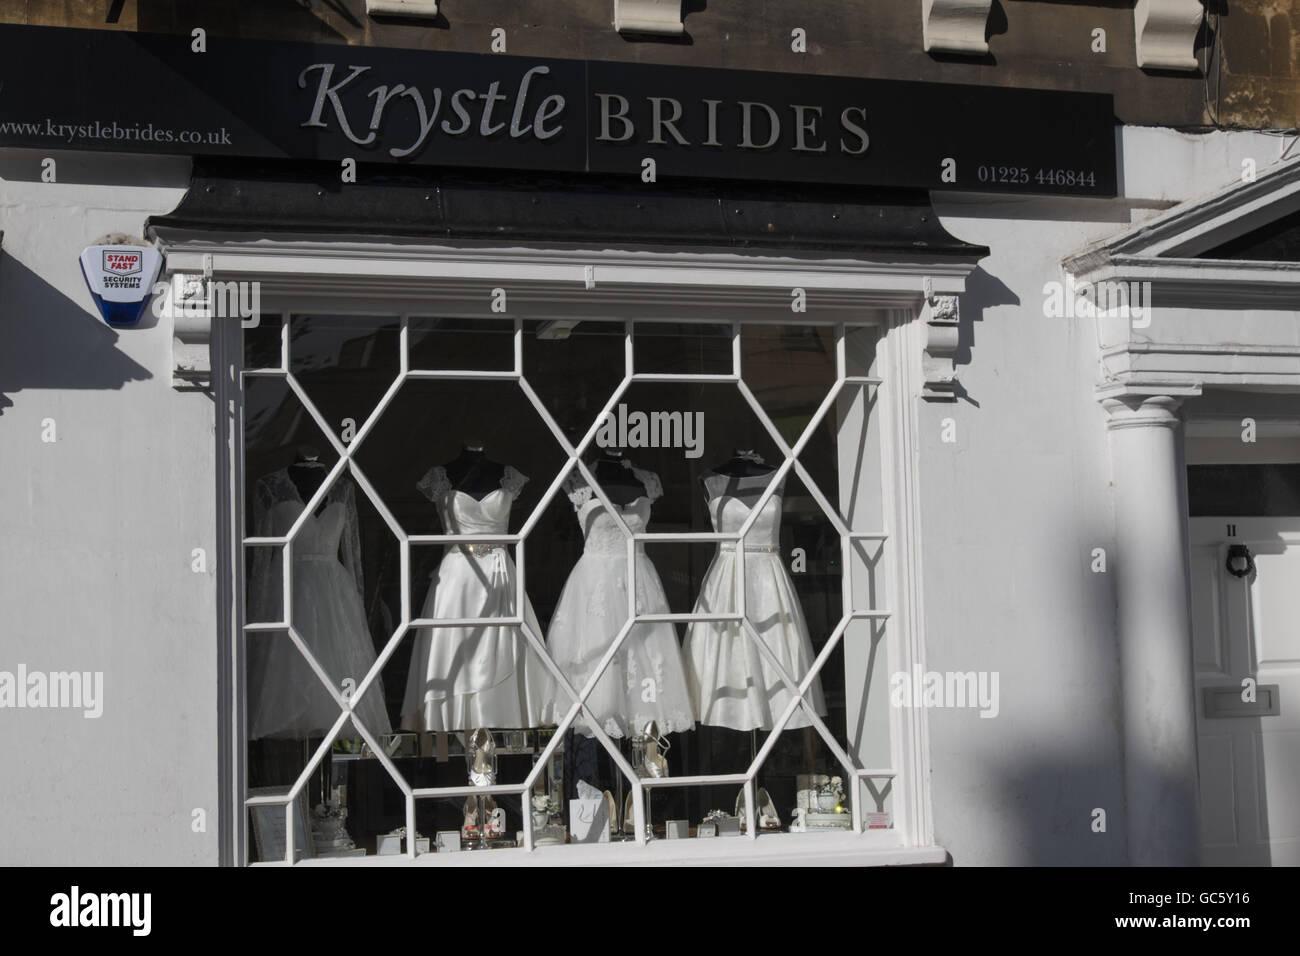 Wedding Dress Shop Window Stock Photos & Wedding Dress Shop Window ...